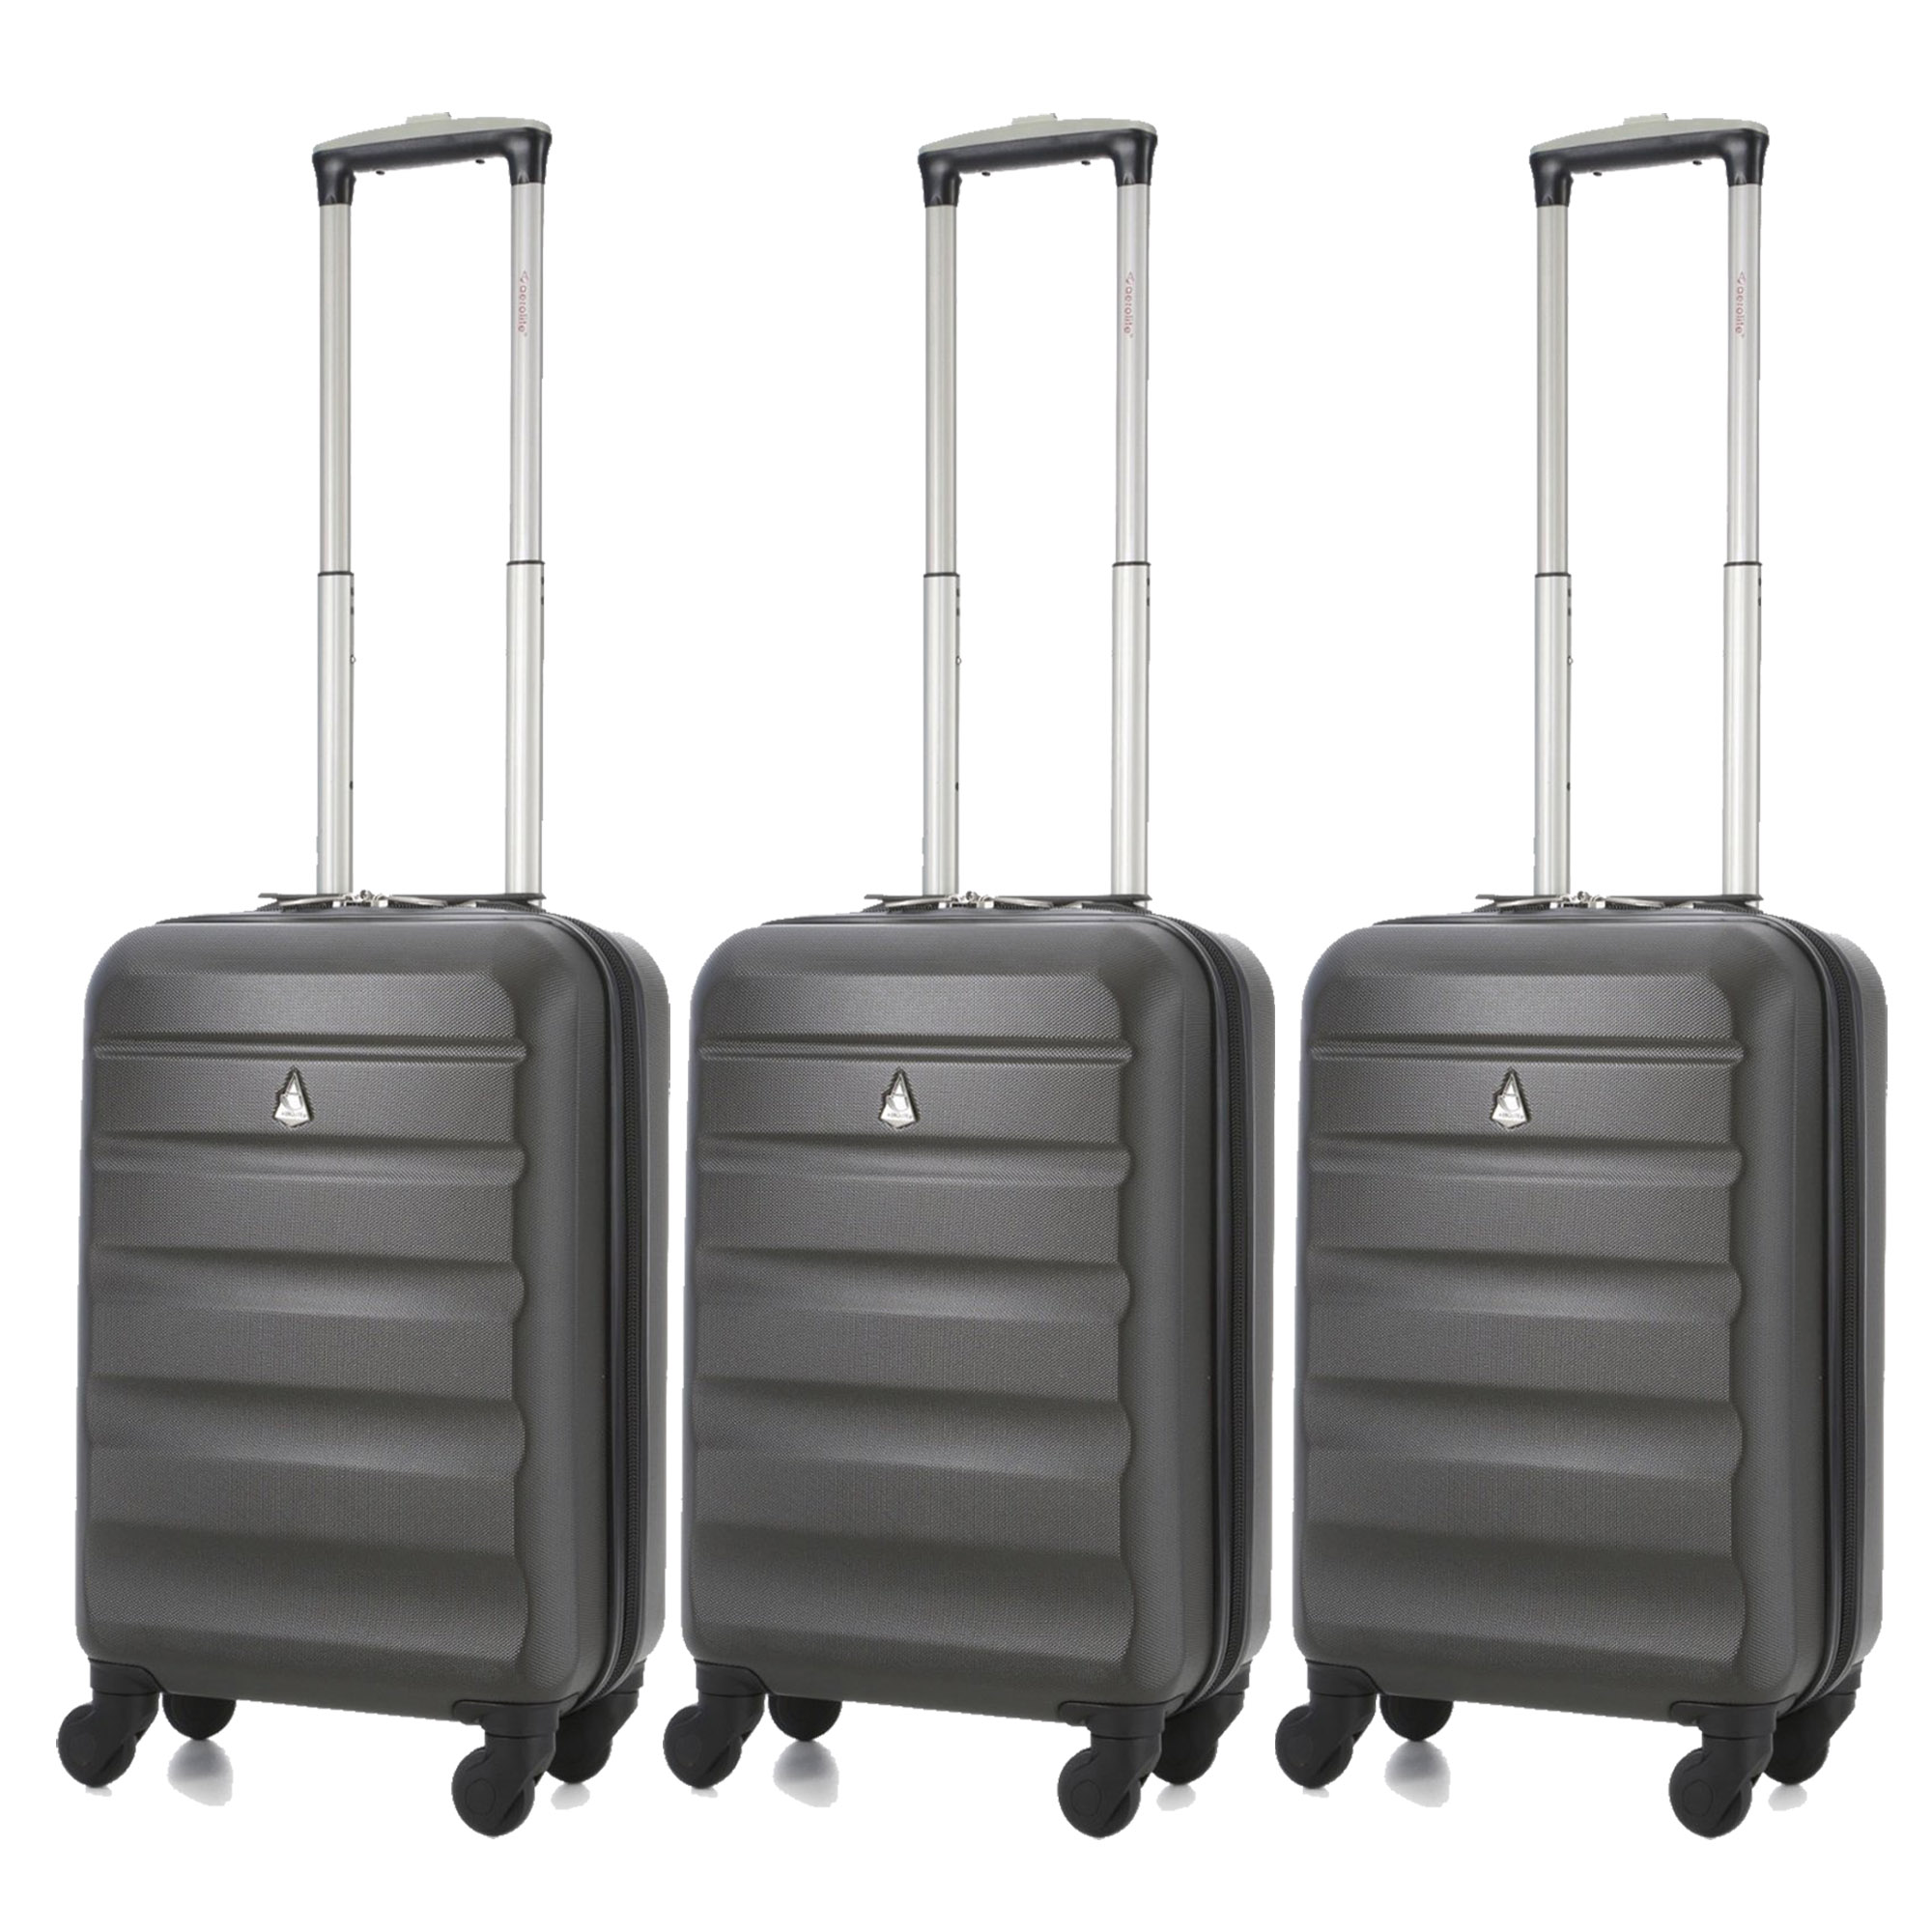 Aerolite Super Lightweight ABS Hard Shell Suitcase - 4 Wheels Set of 3